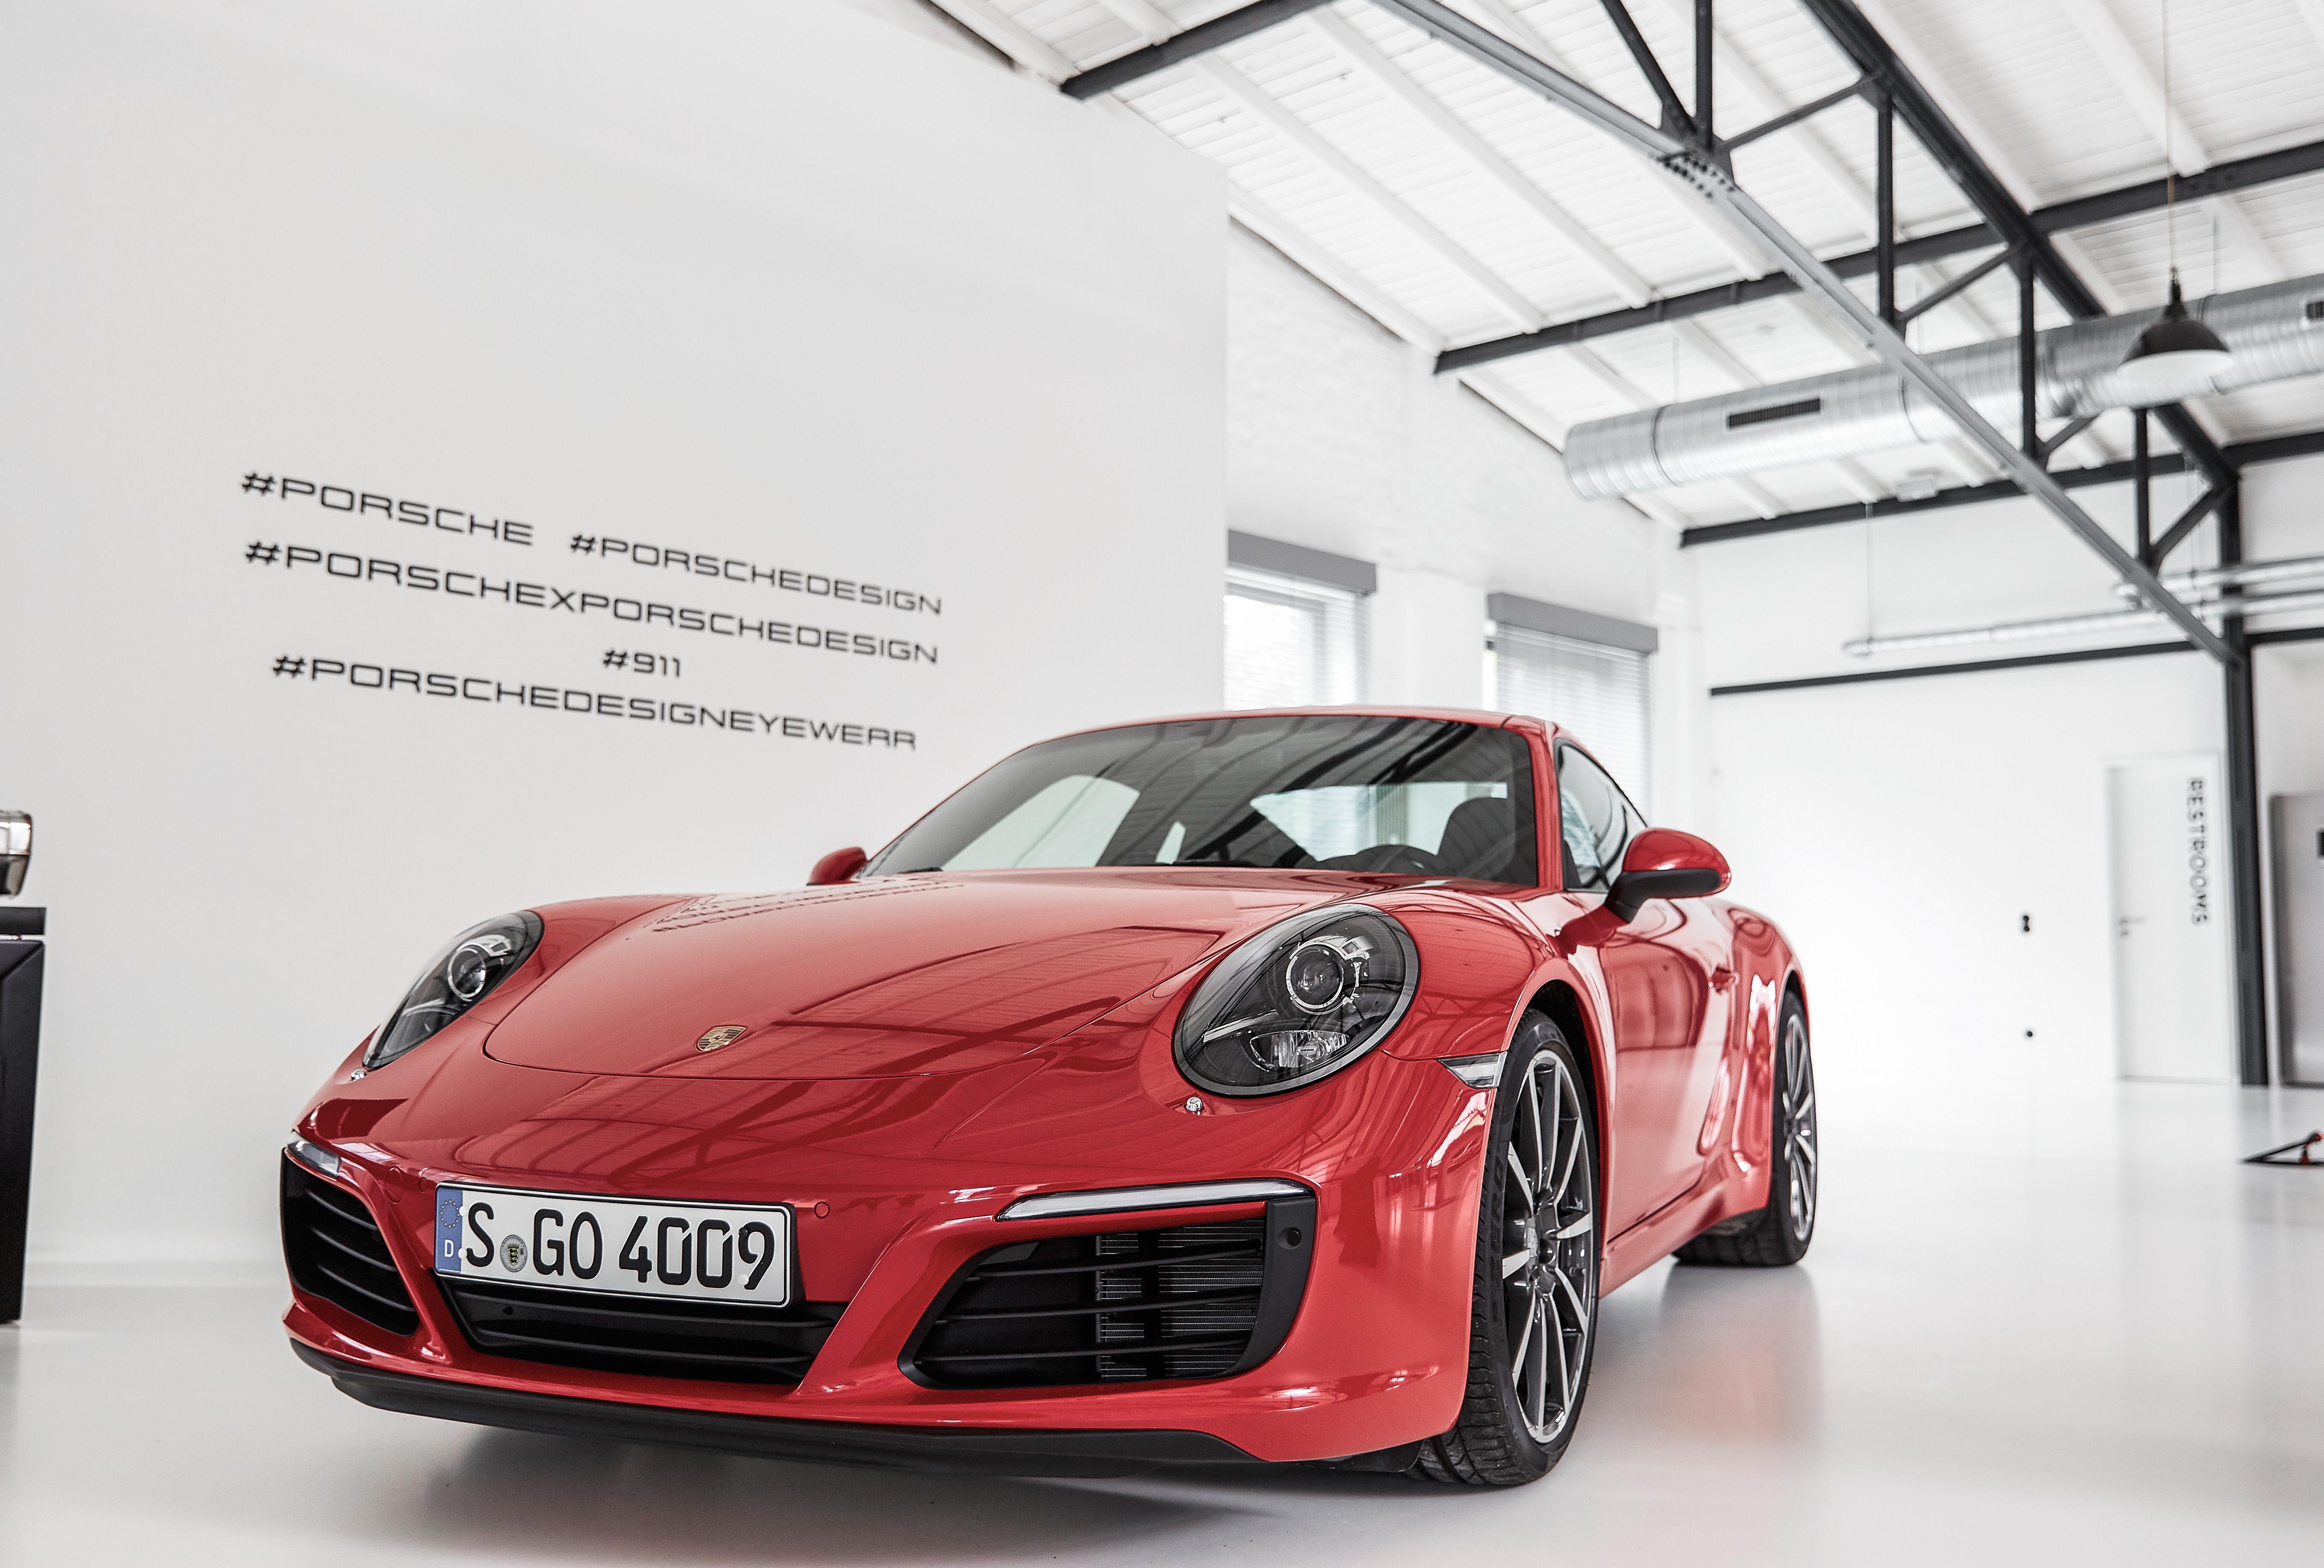 Tommeezjerry-Maennermodeblog-Maennermode--Blog-Fashionblog-Styleblog-Berlinblog-Mensblog-Hamburg-Porsche-AG-Porsche-Design-Carrera-4-S-Sportwagen-Roadtrip-Event